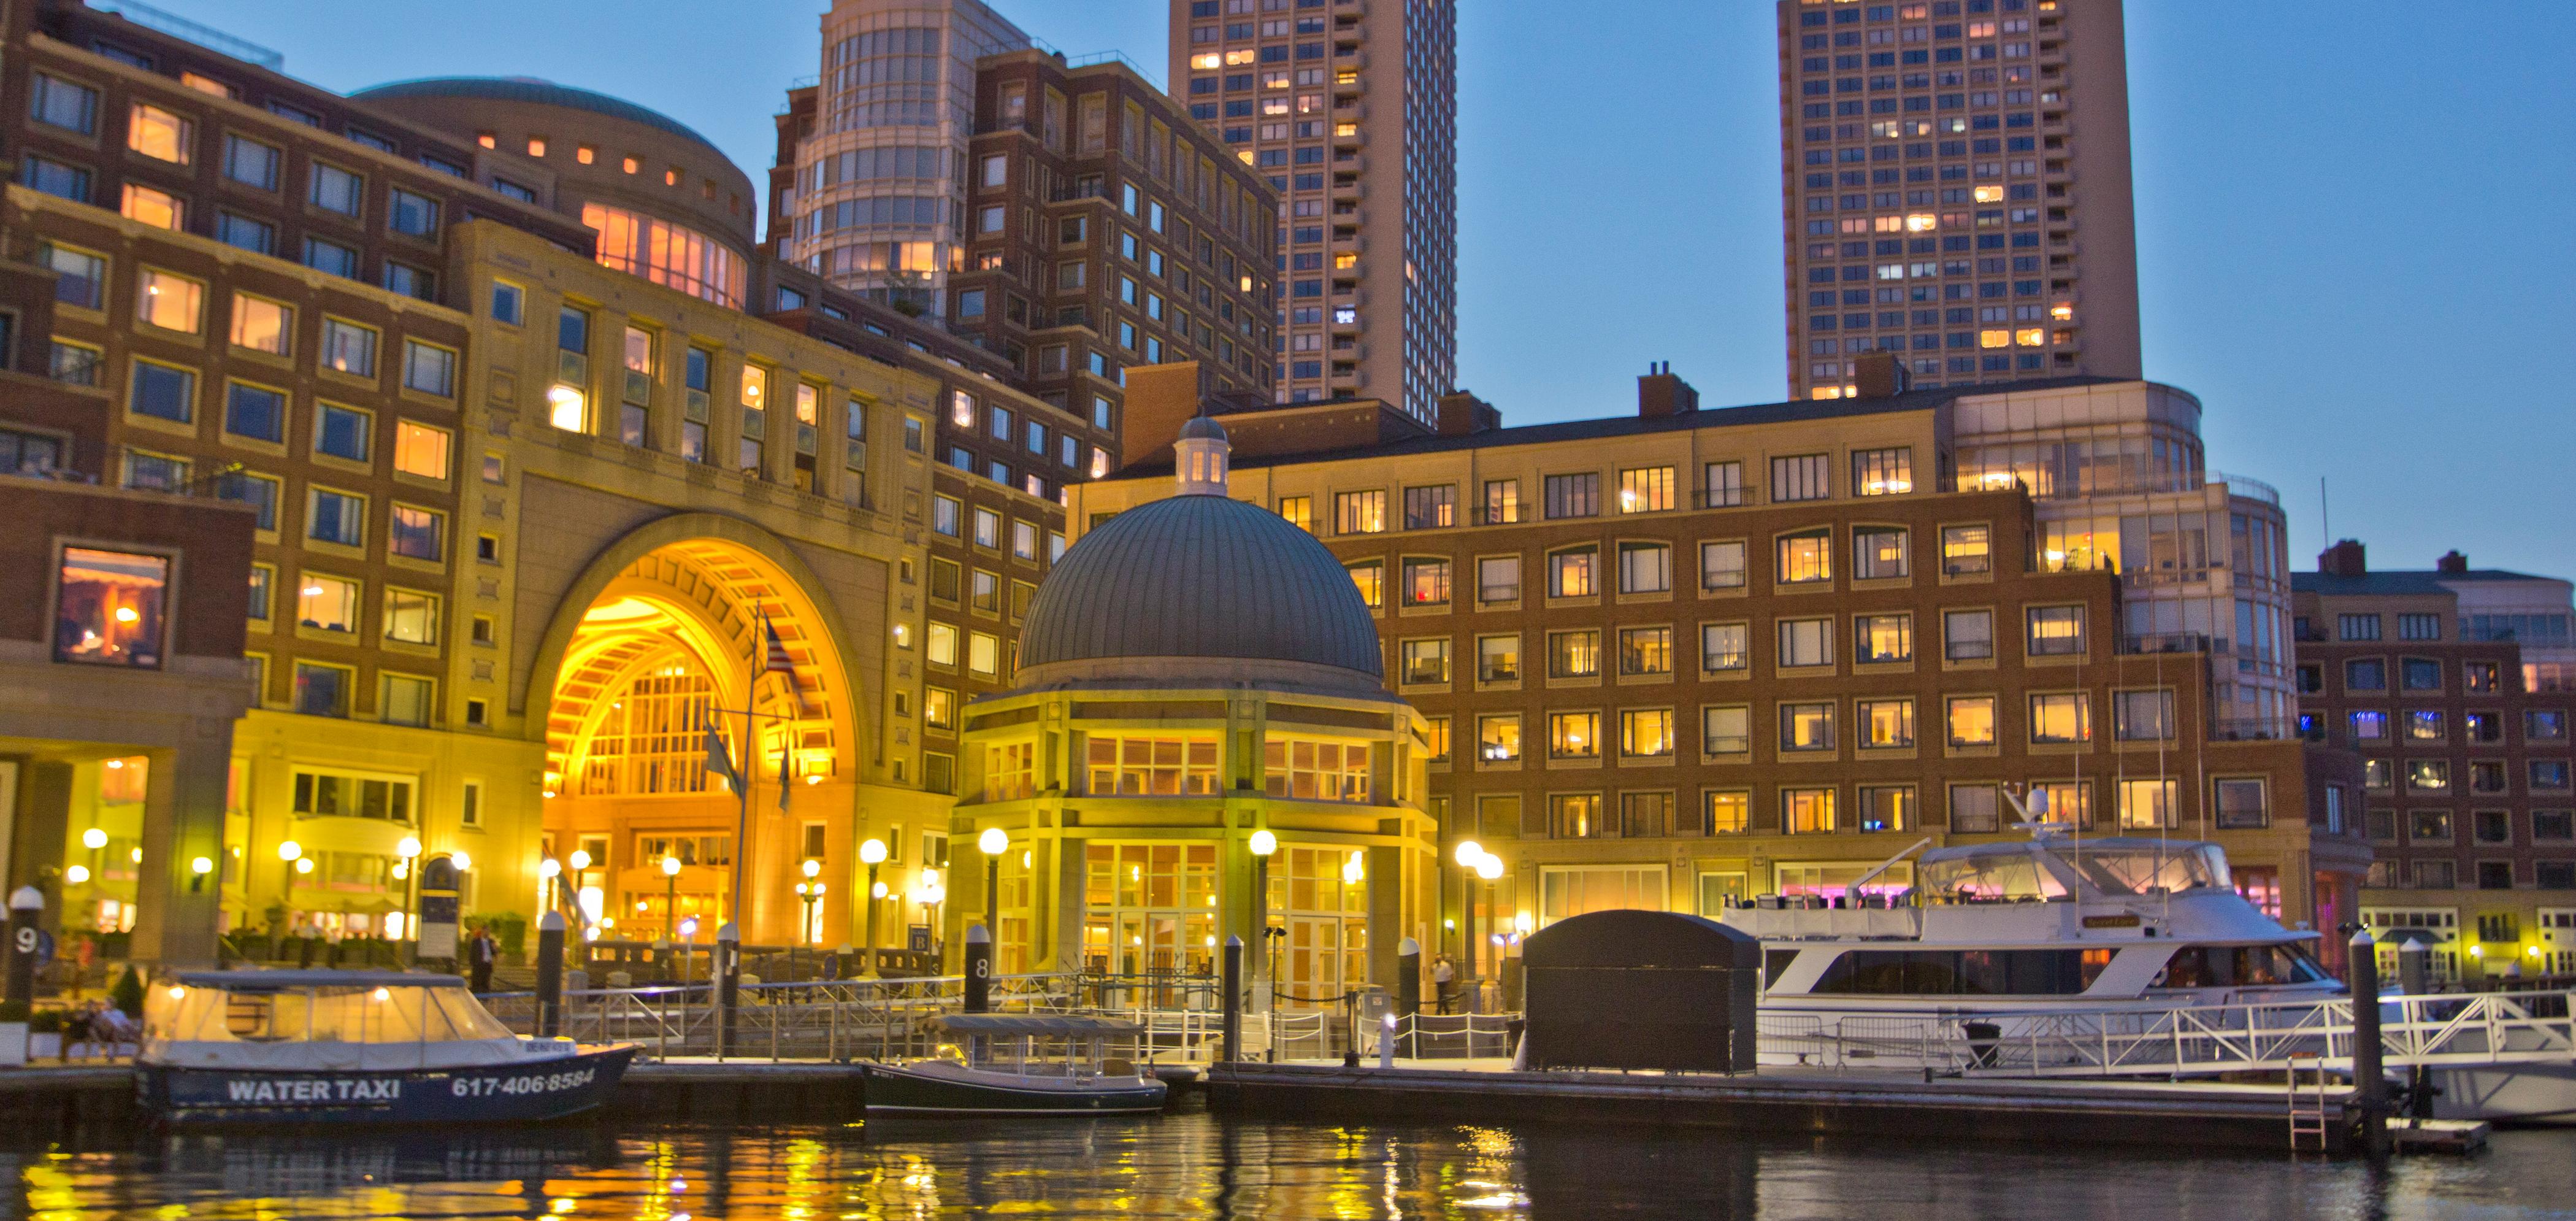 Best Hotel Location In Boston